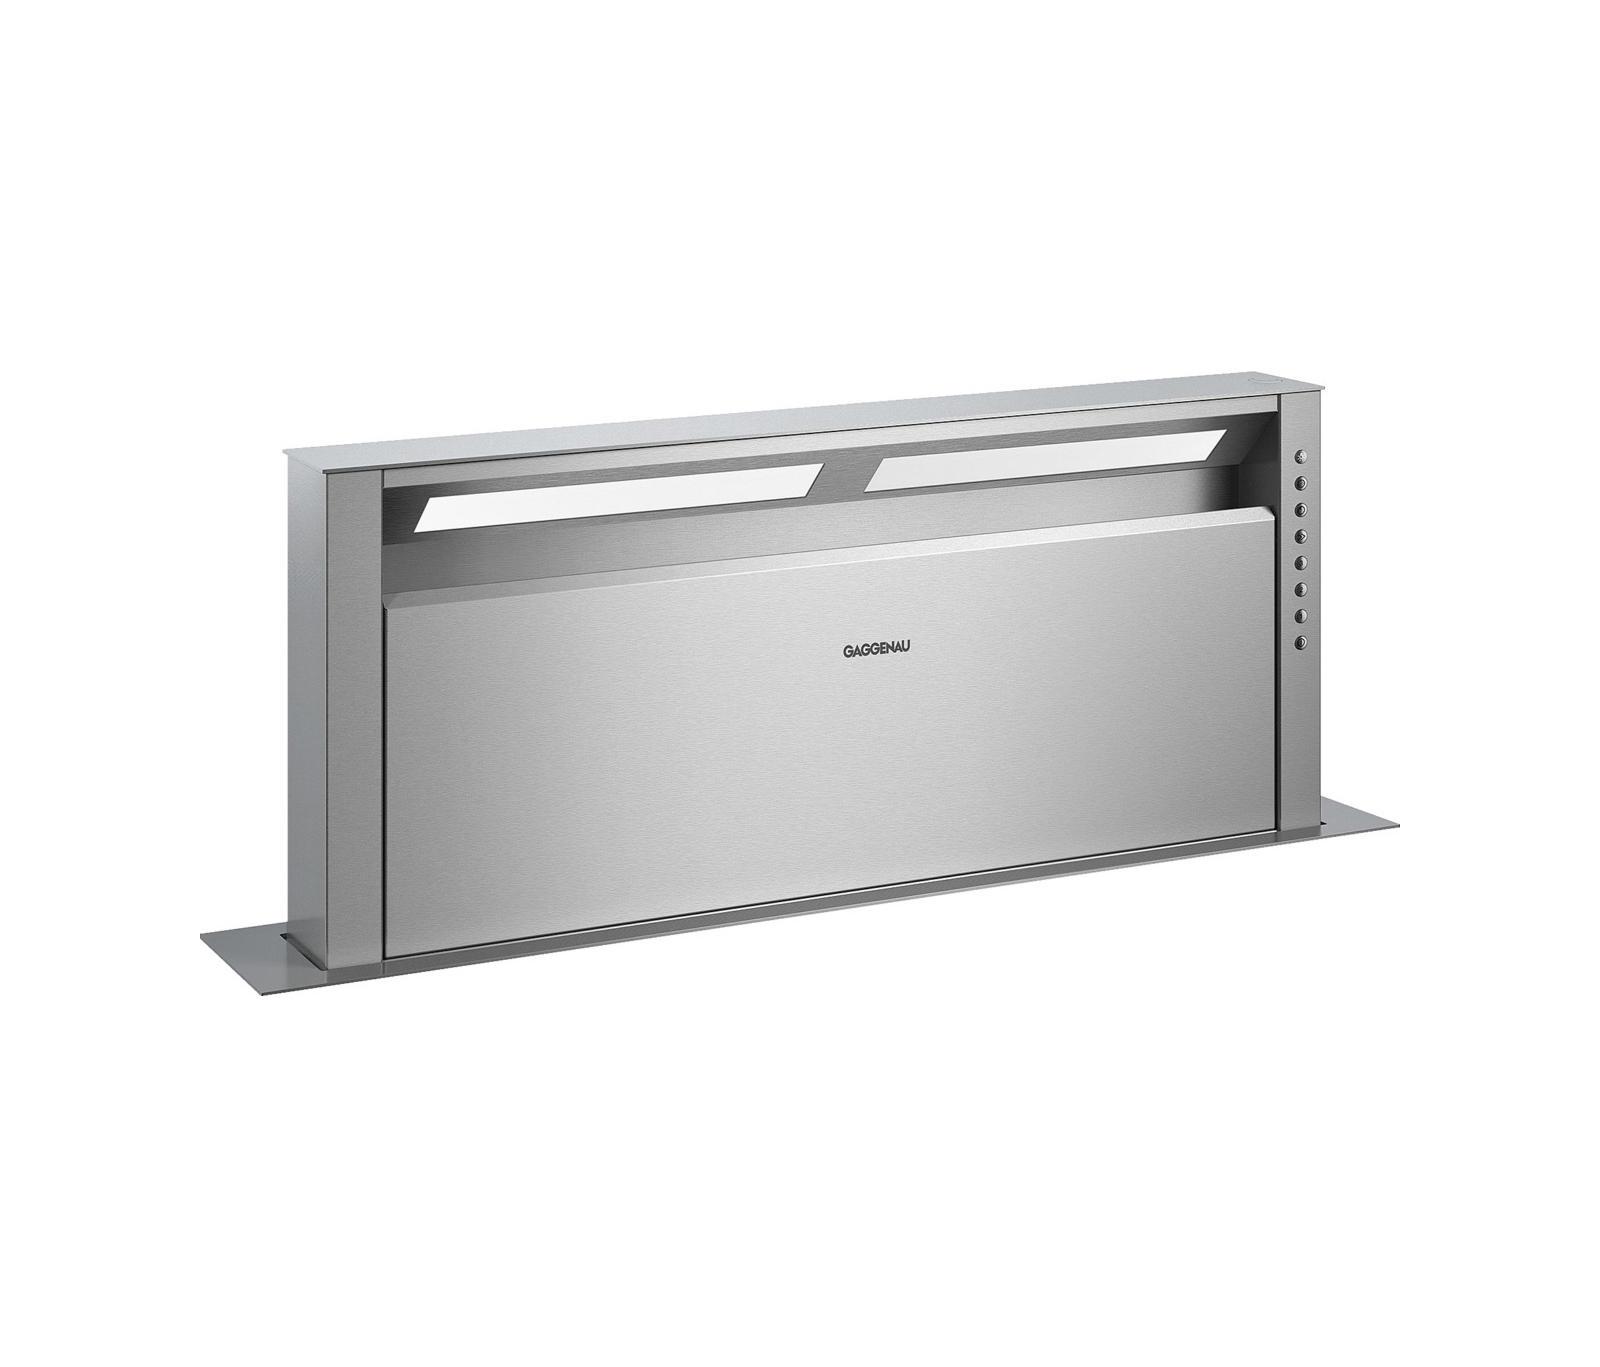 table ventilation 400 series al 400 extractors from. Black Bedroom Furniture Sets. Home Design Ideas